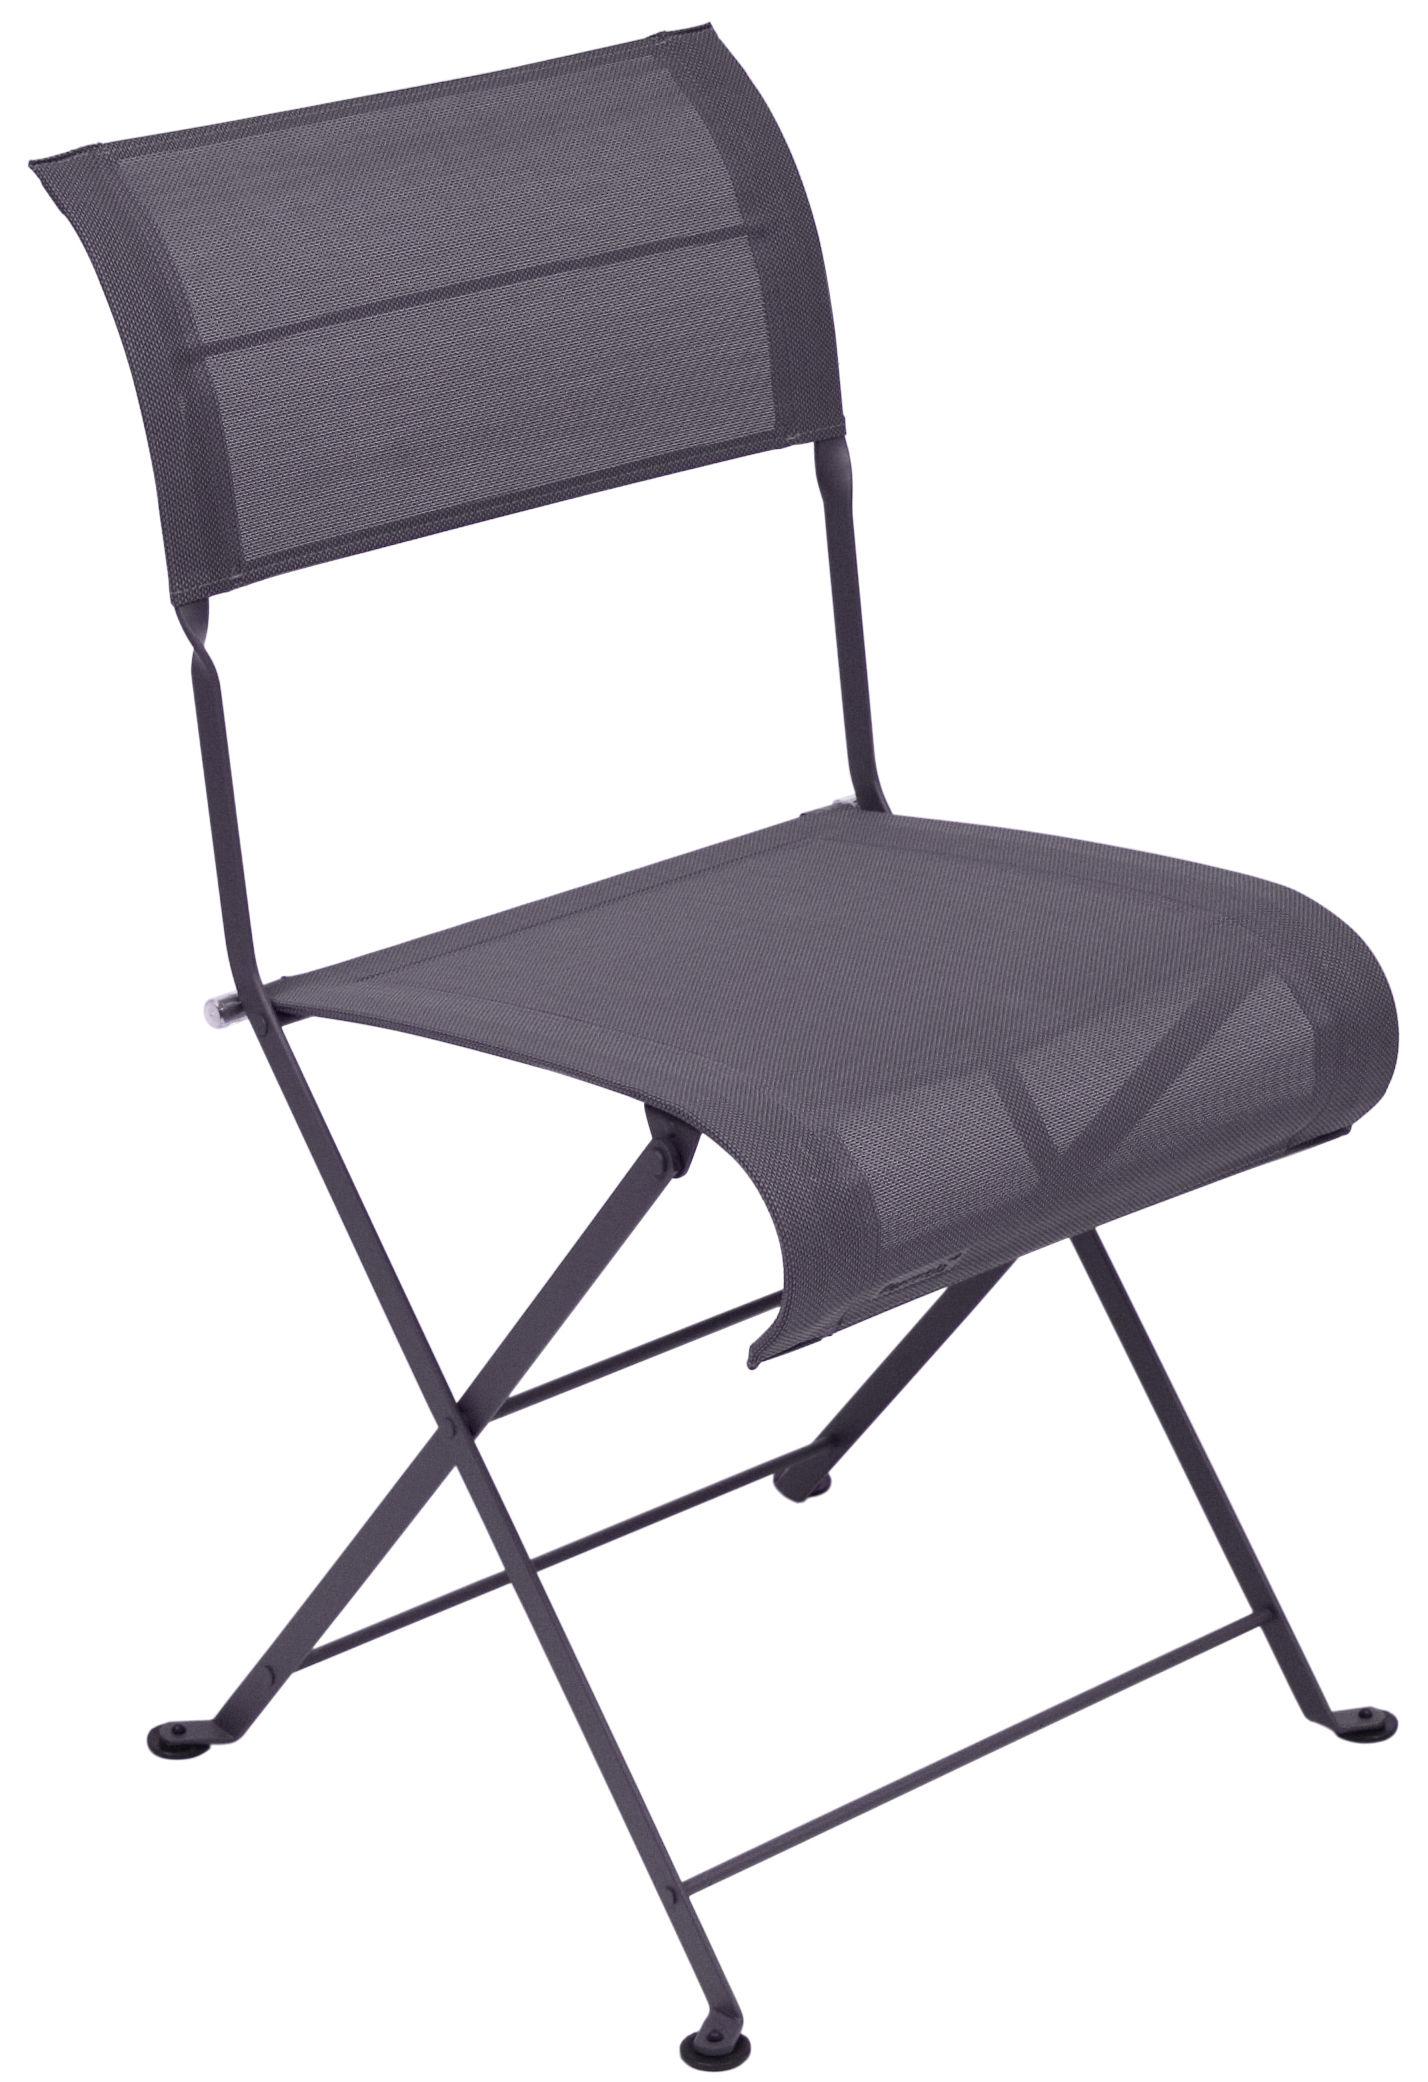 Chaise pliante dune toile prune chin fermob - Chaise pliante en toile ...